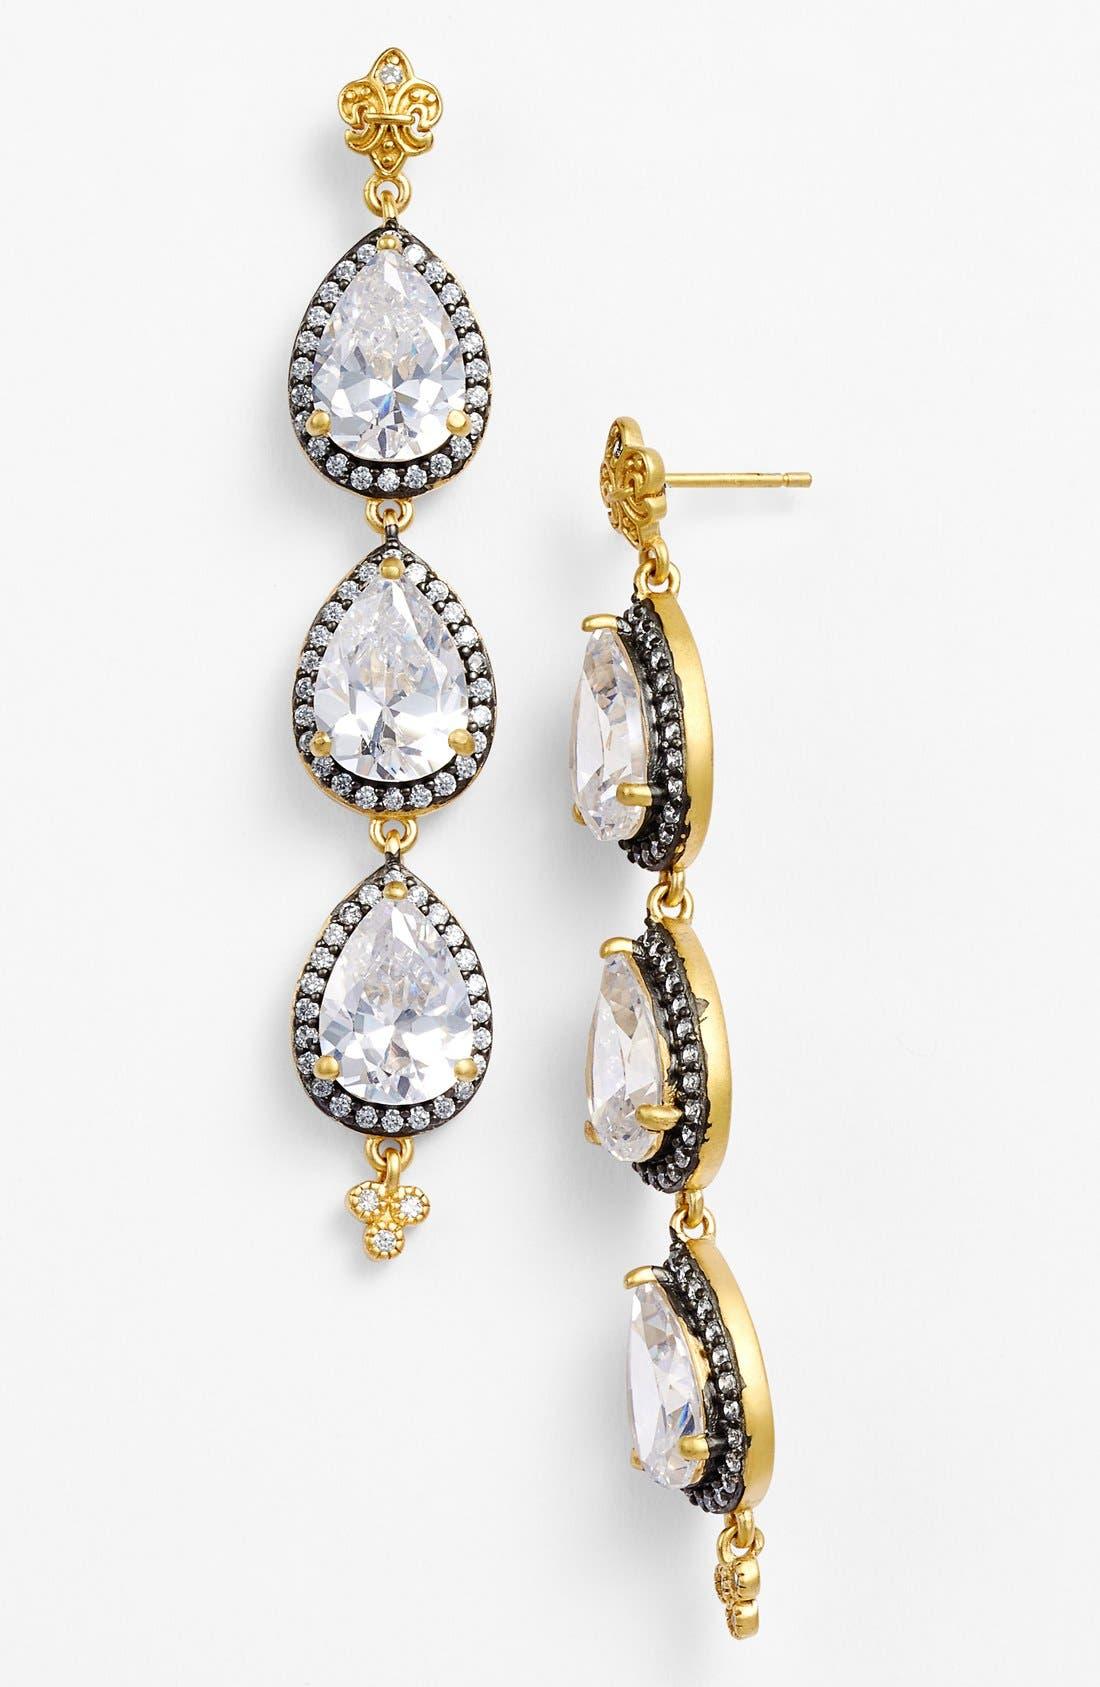 Main Image - FREIDA ROTHMAN 'Femme' Linear Earrings